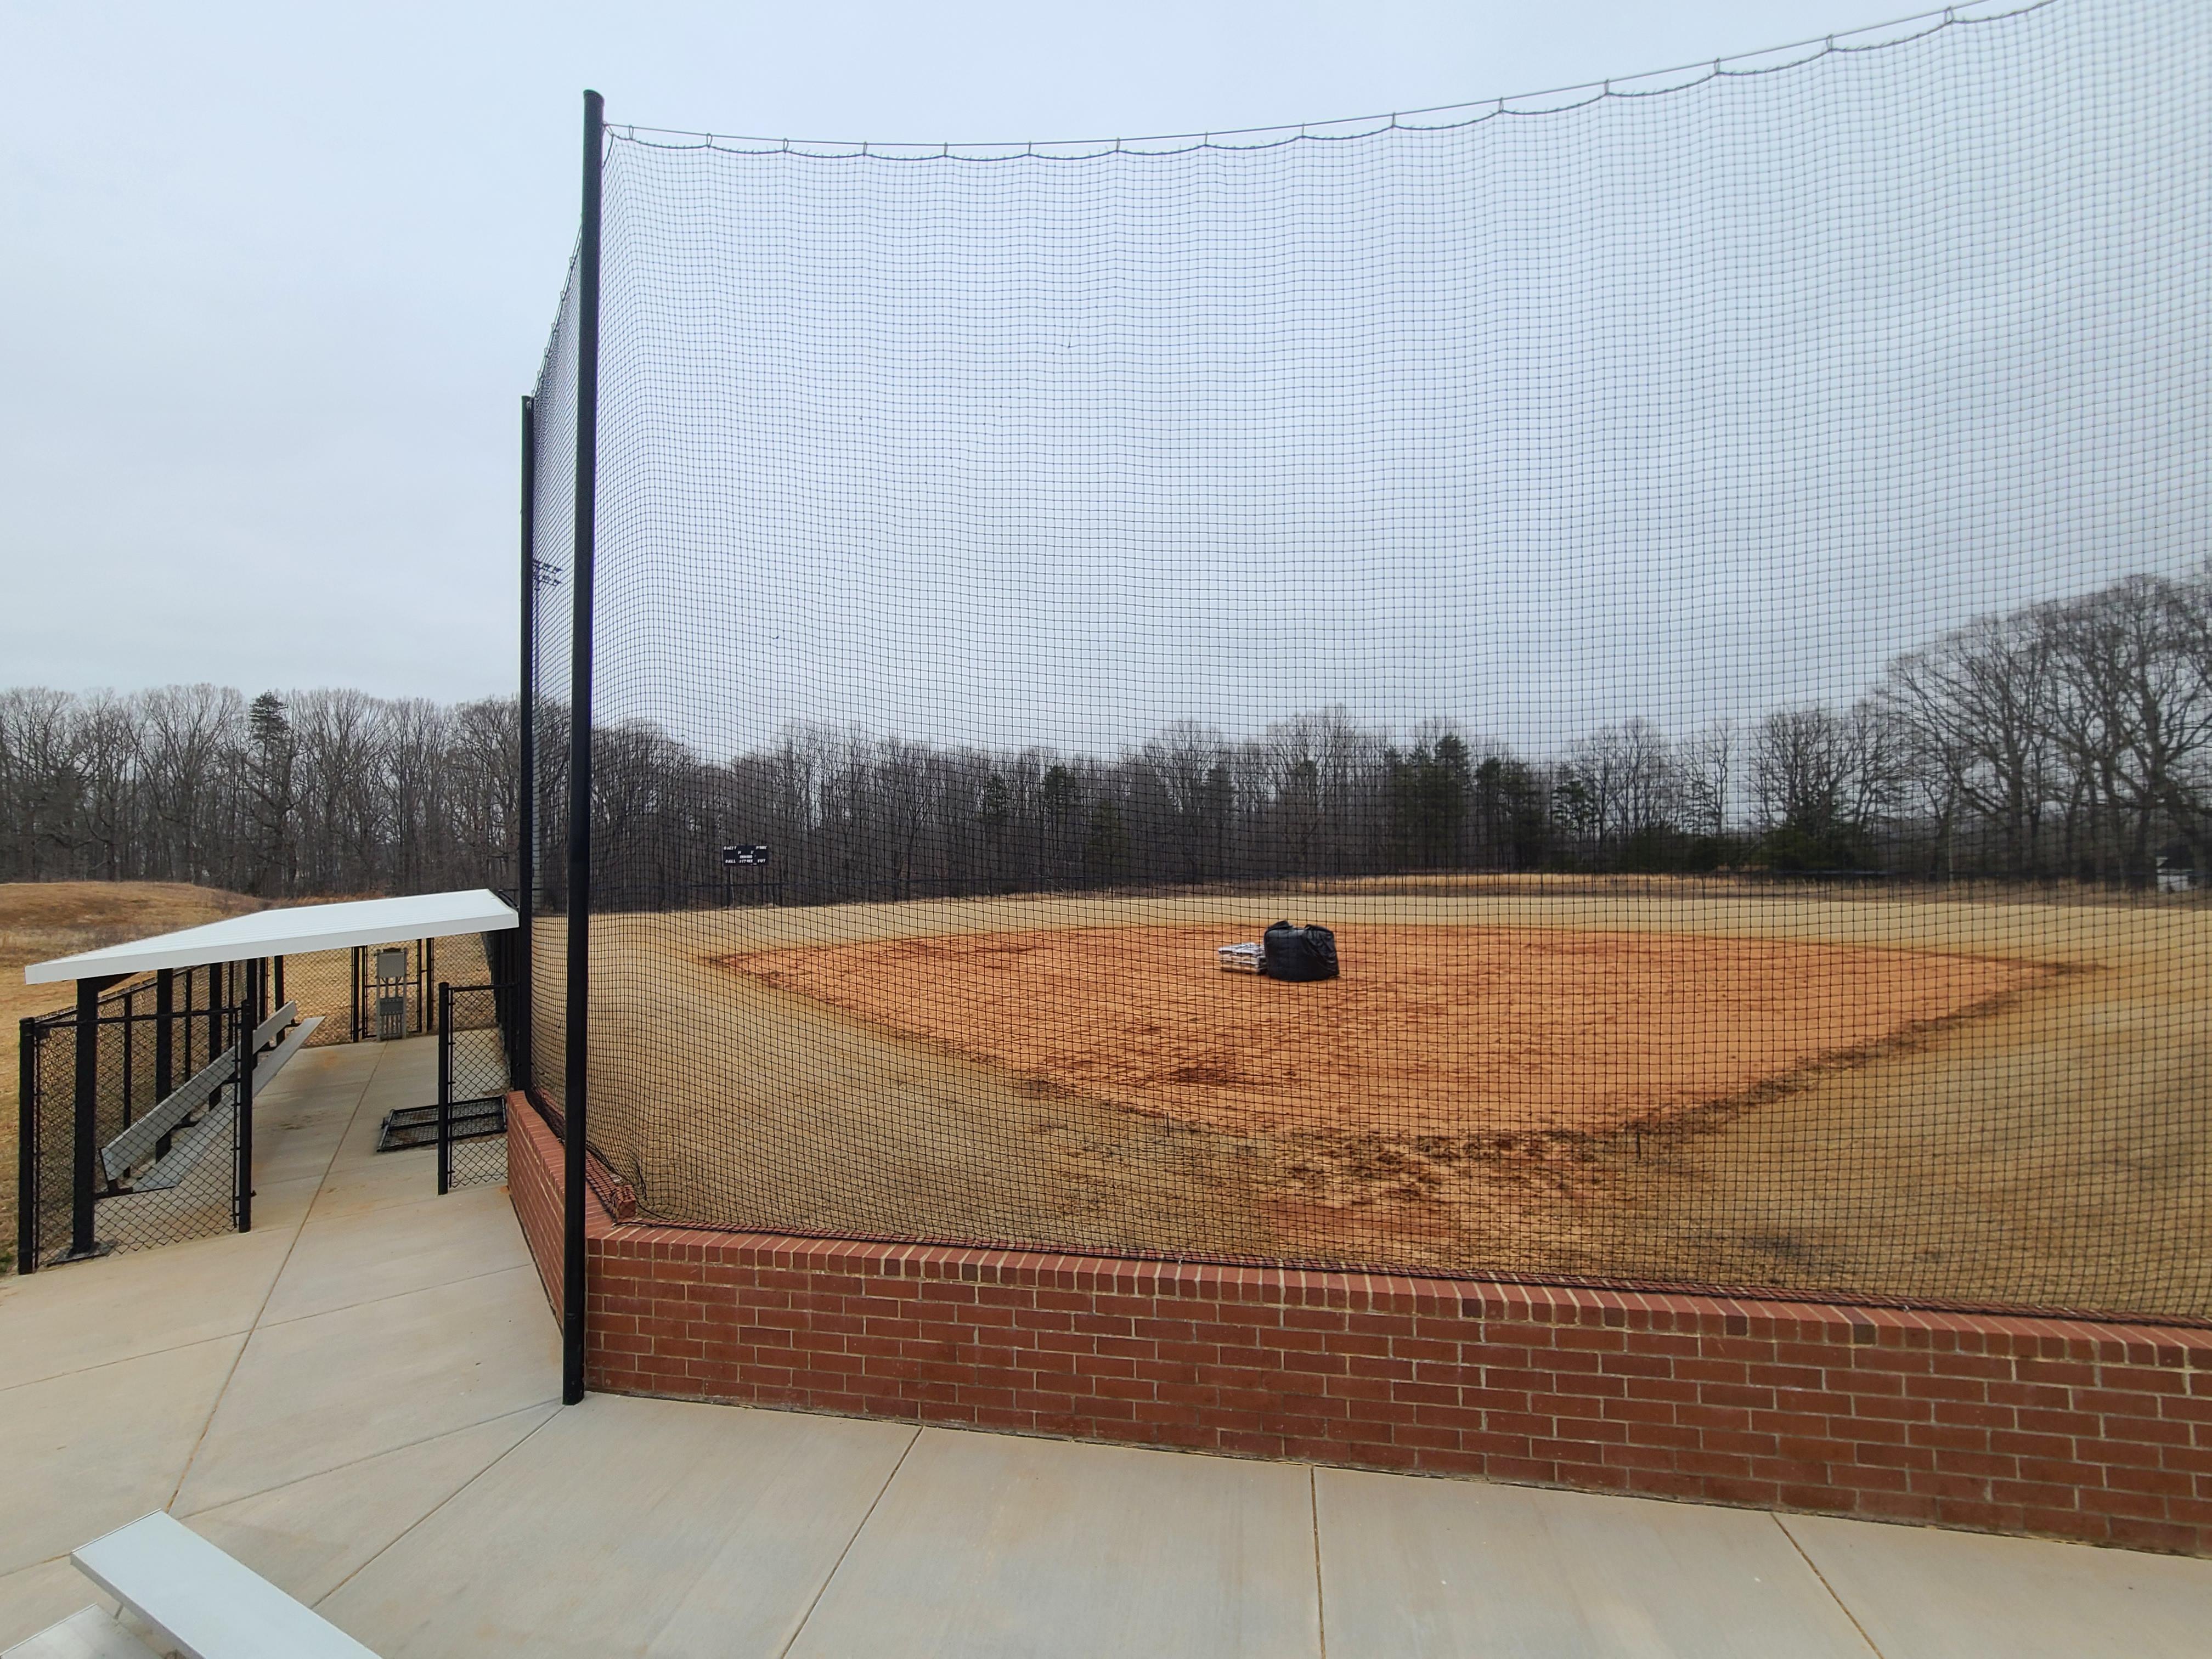 NCLA Softball Field